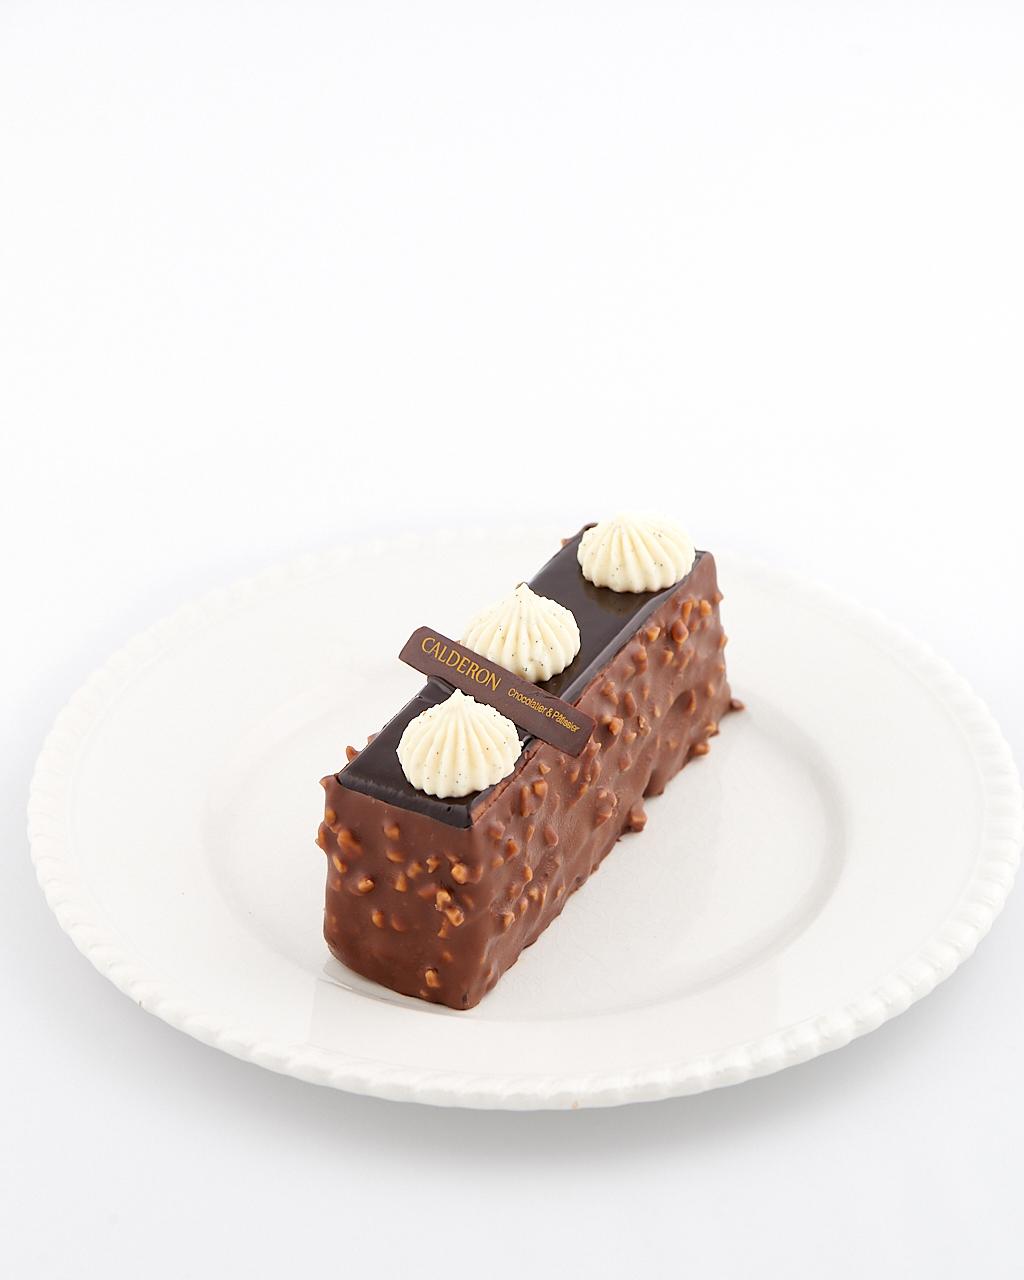 photo culinaire d'un gâteau au chocolat